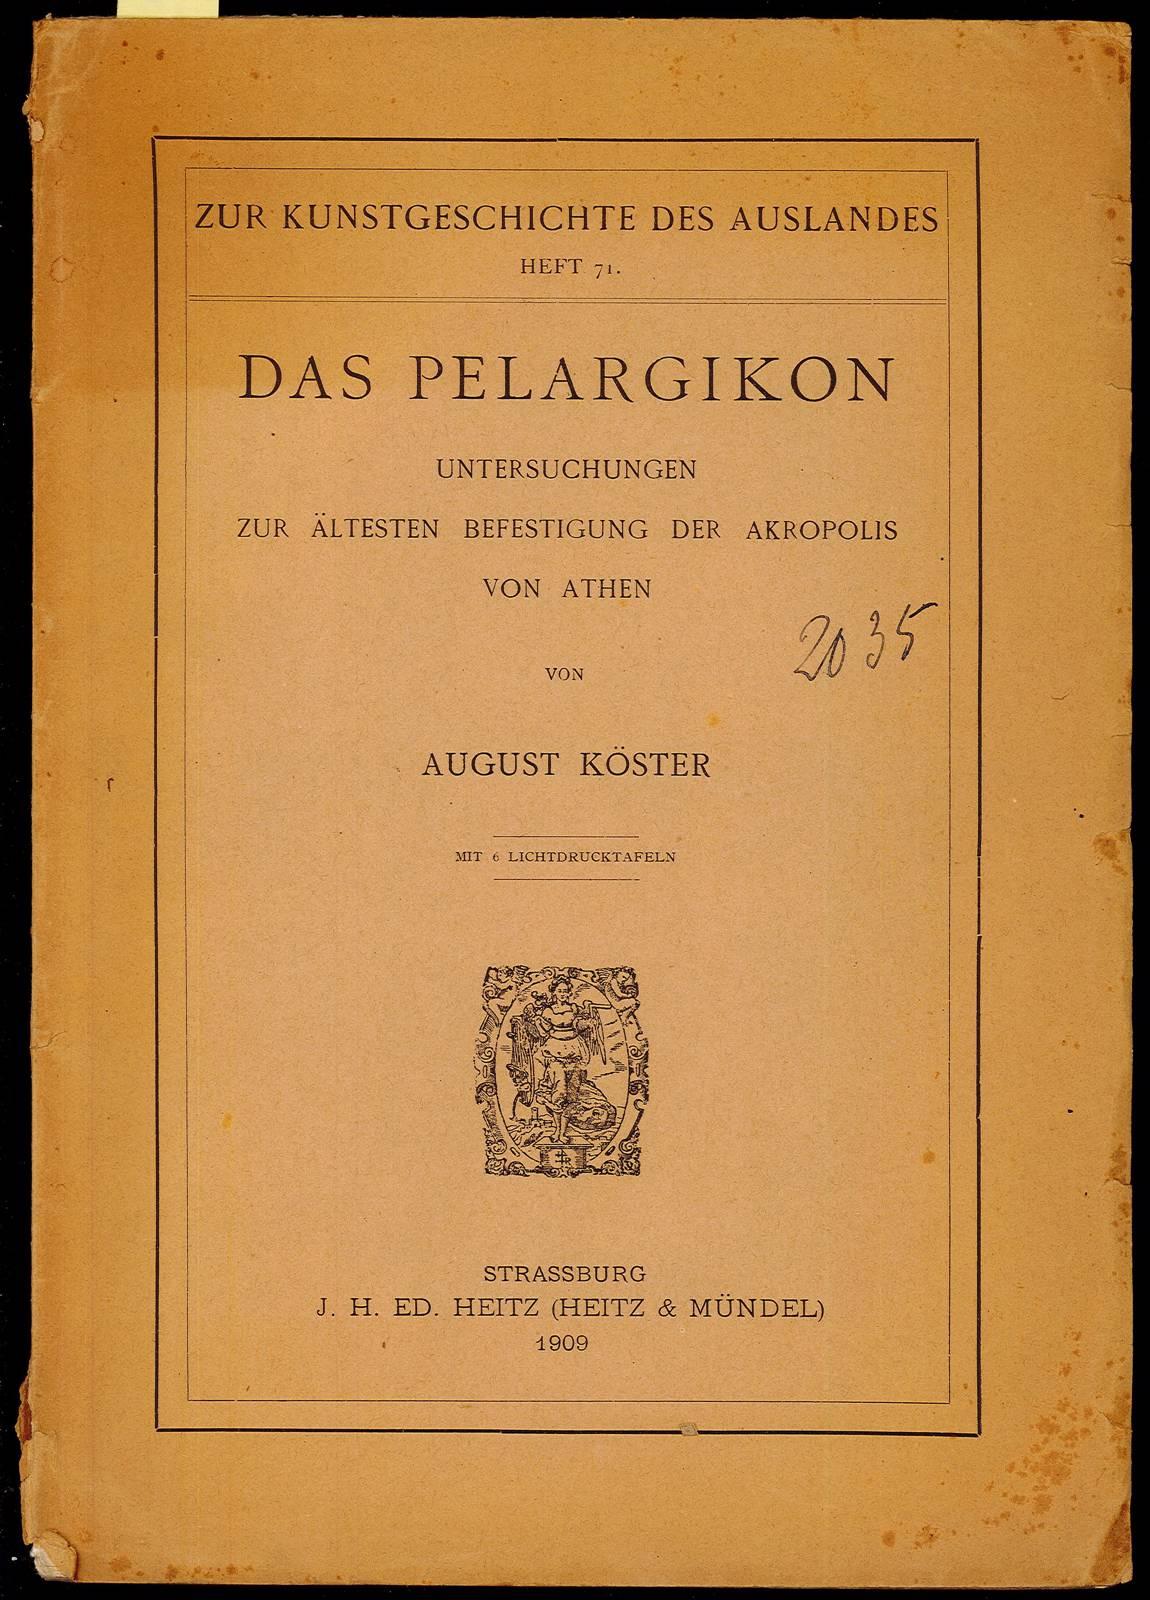 Das pelargikon: Koster August